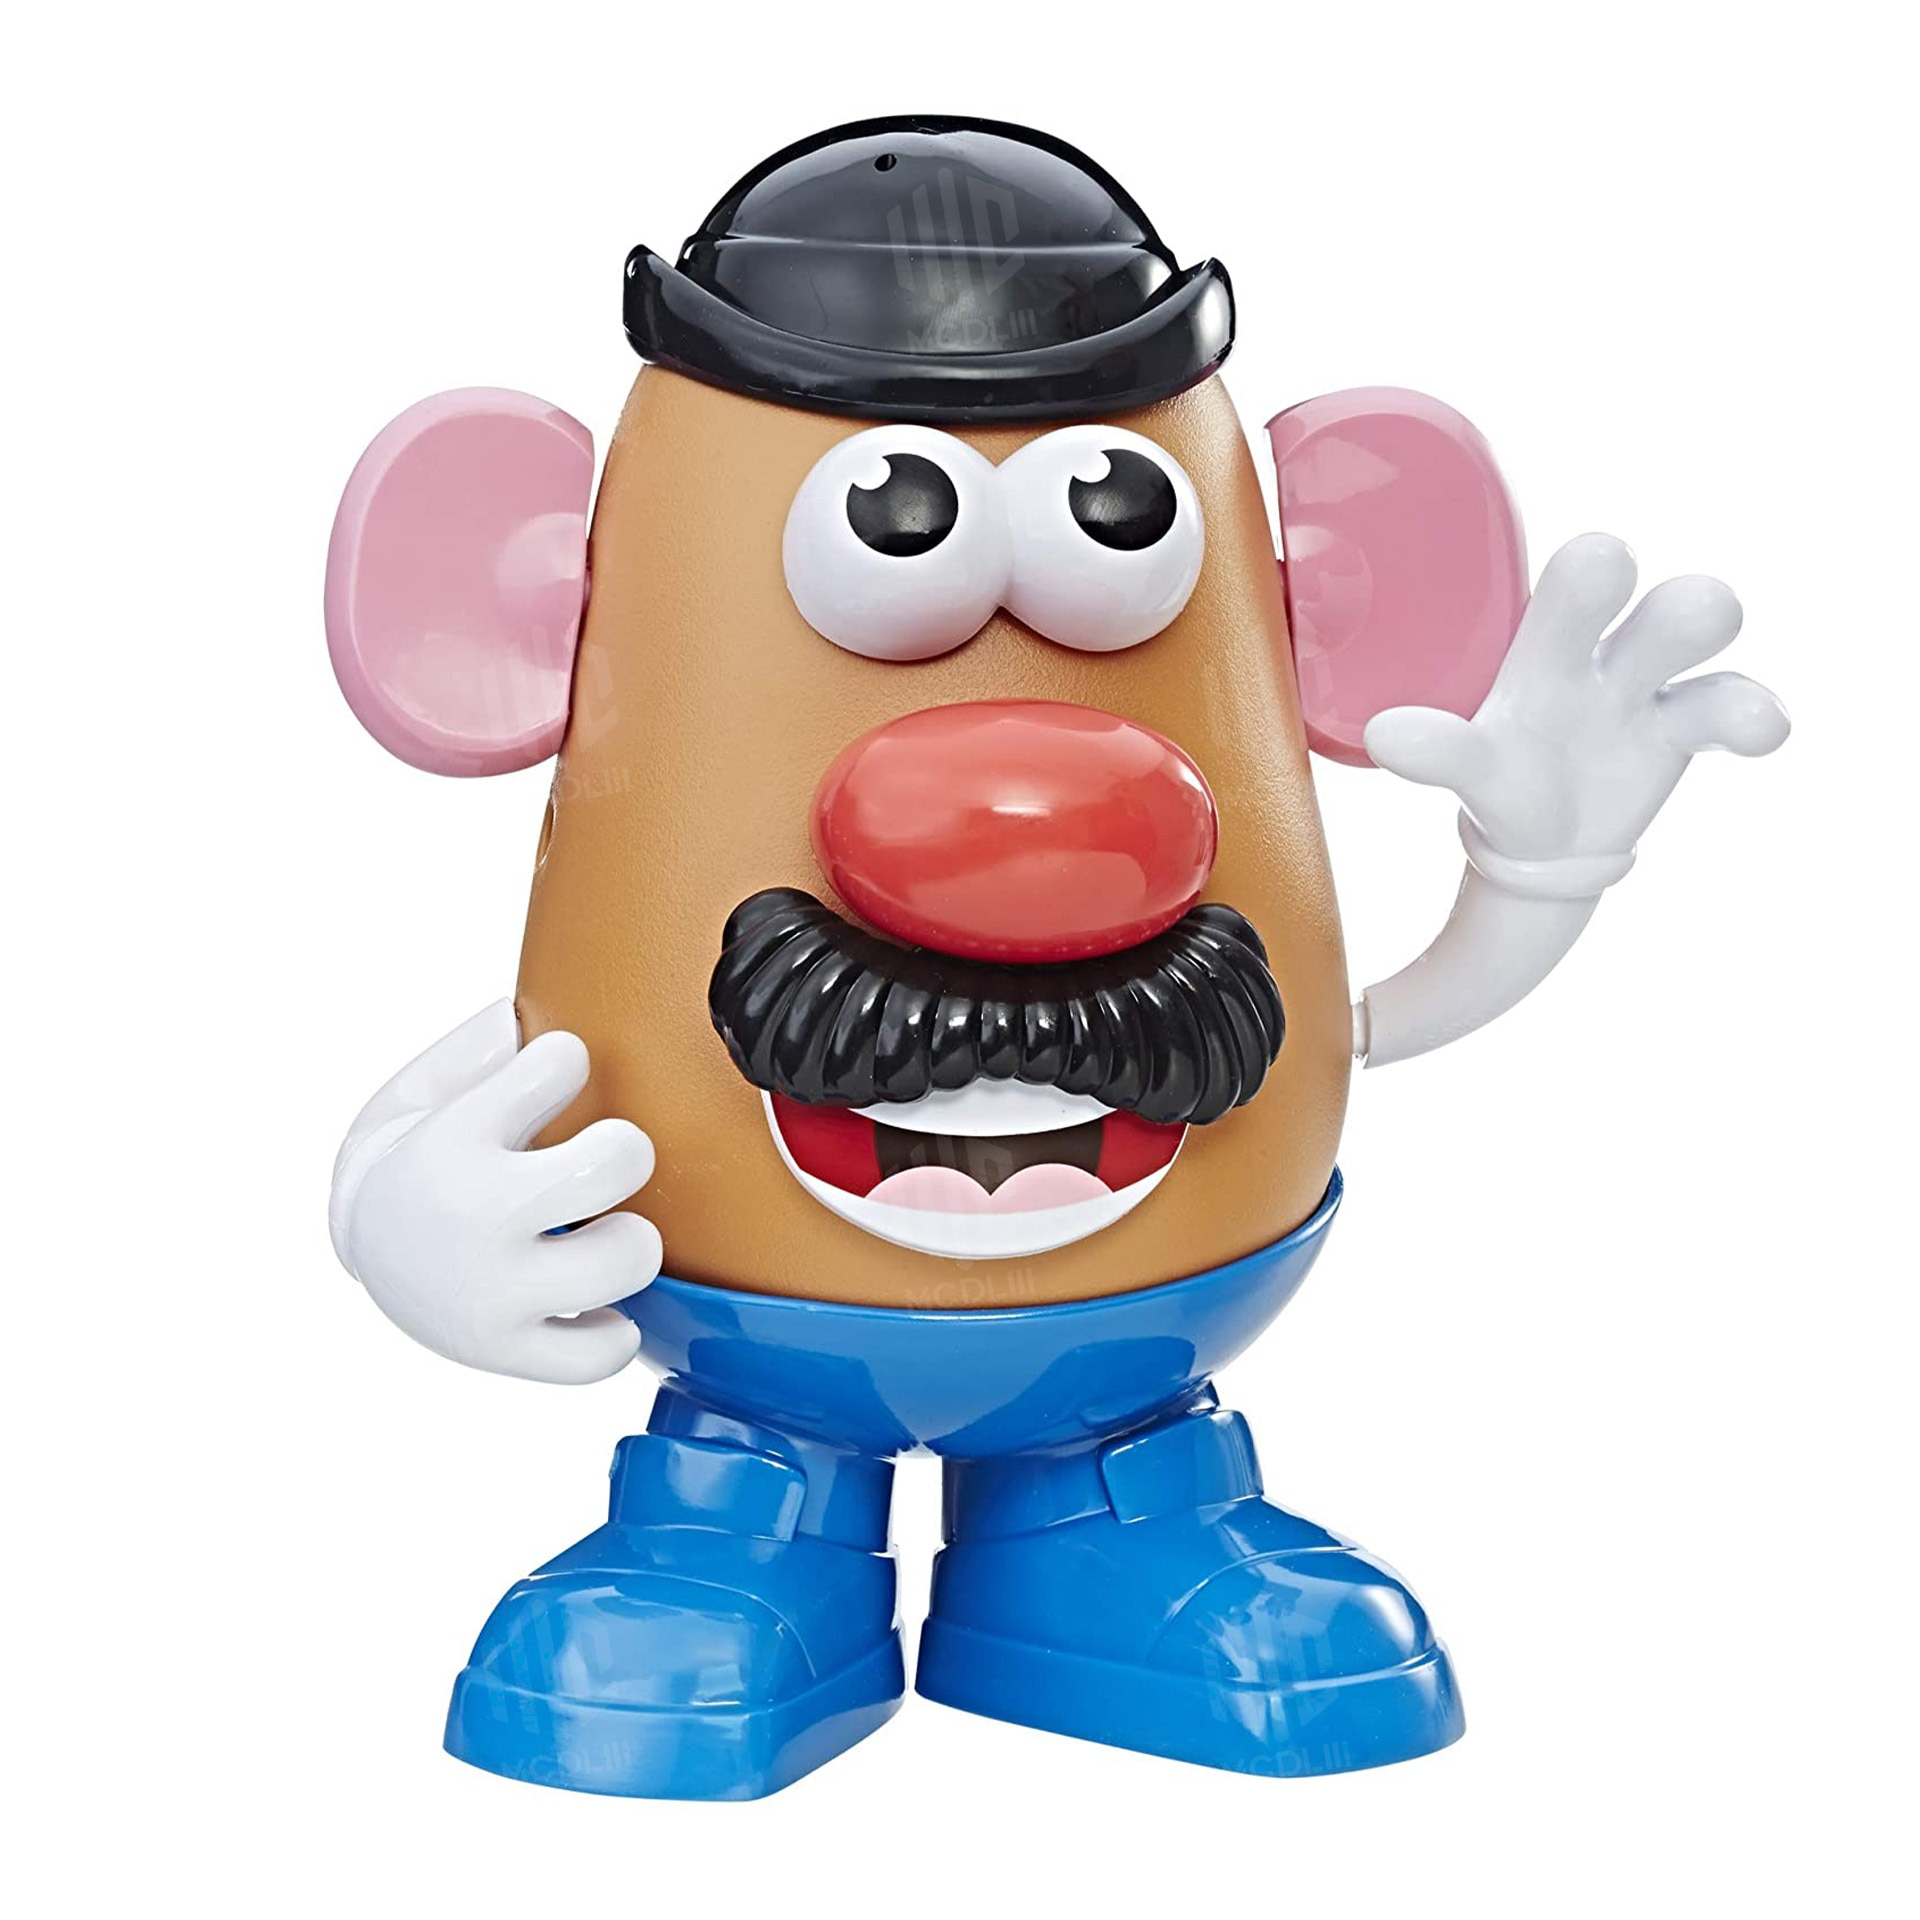 Mr. Potato Head - the classic and good version